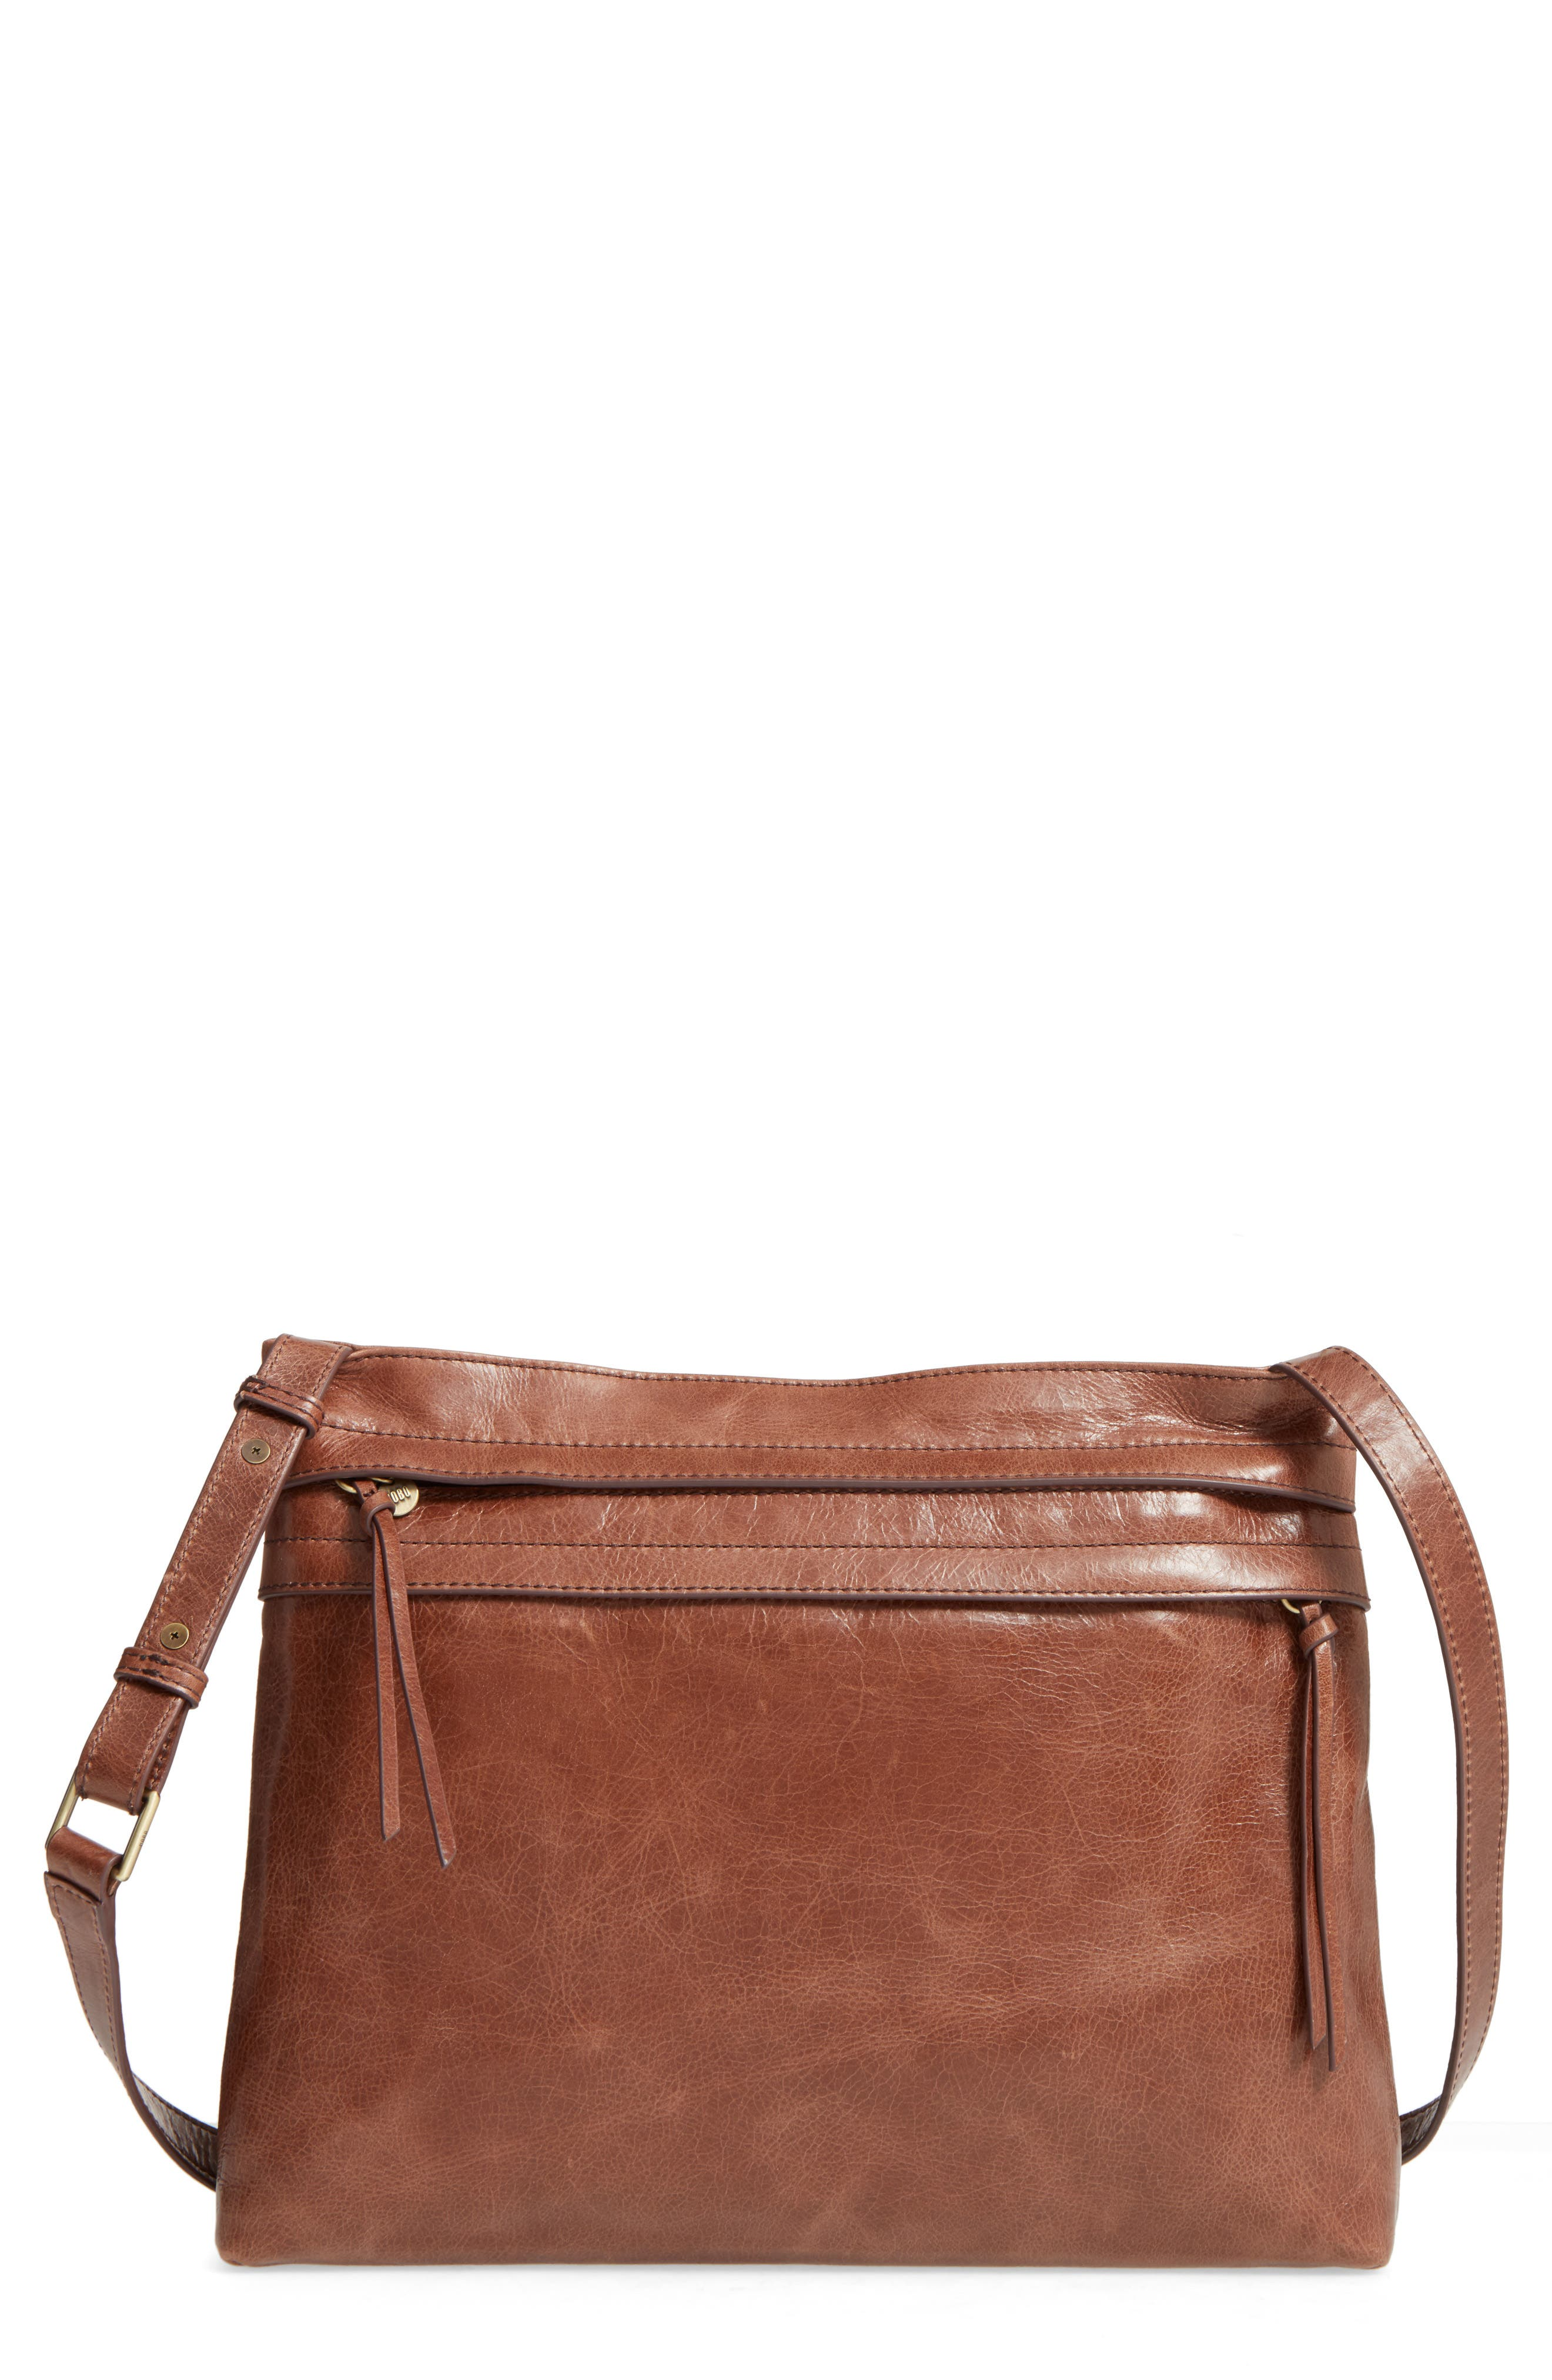 Main Image - Hobo Larkin Leather Messenger Bag